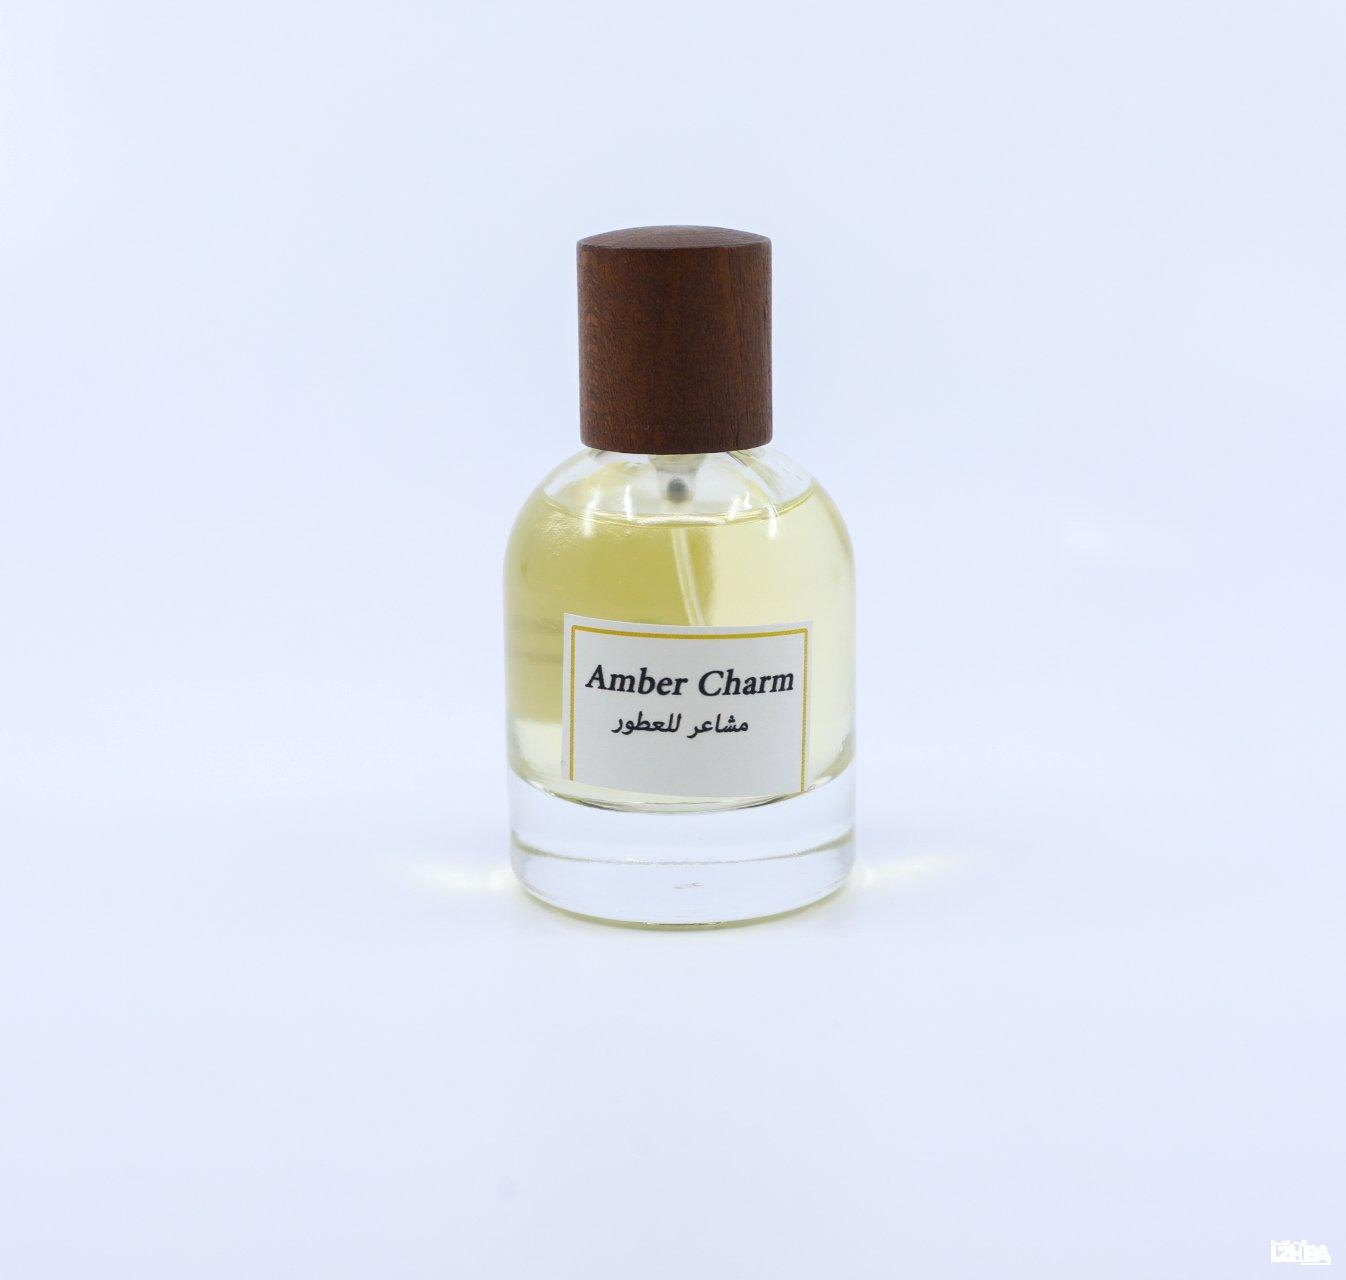 Amber Charm Perfume